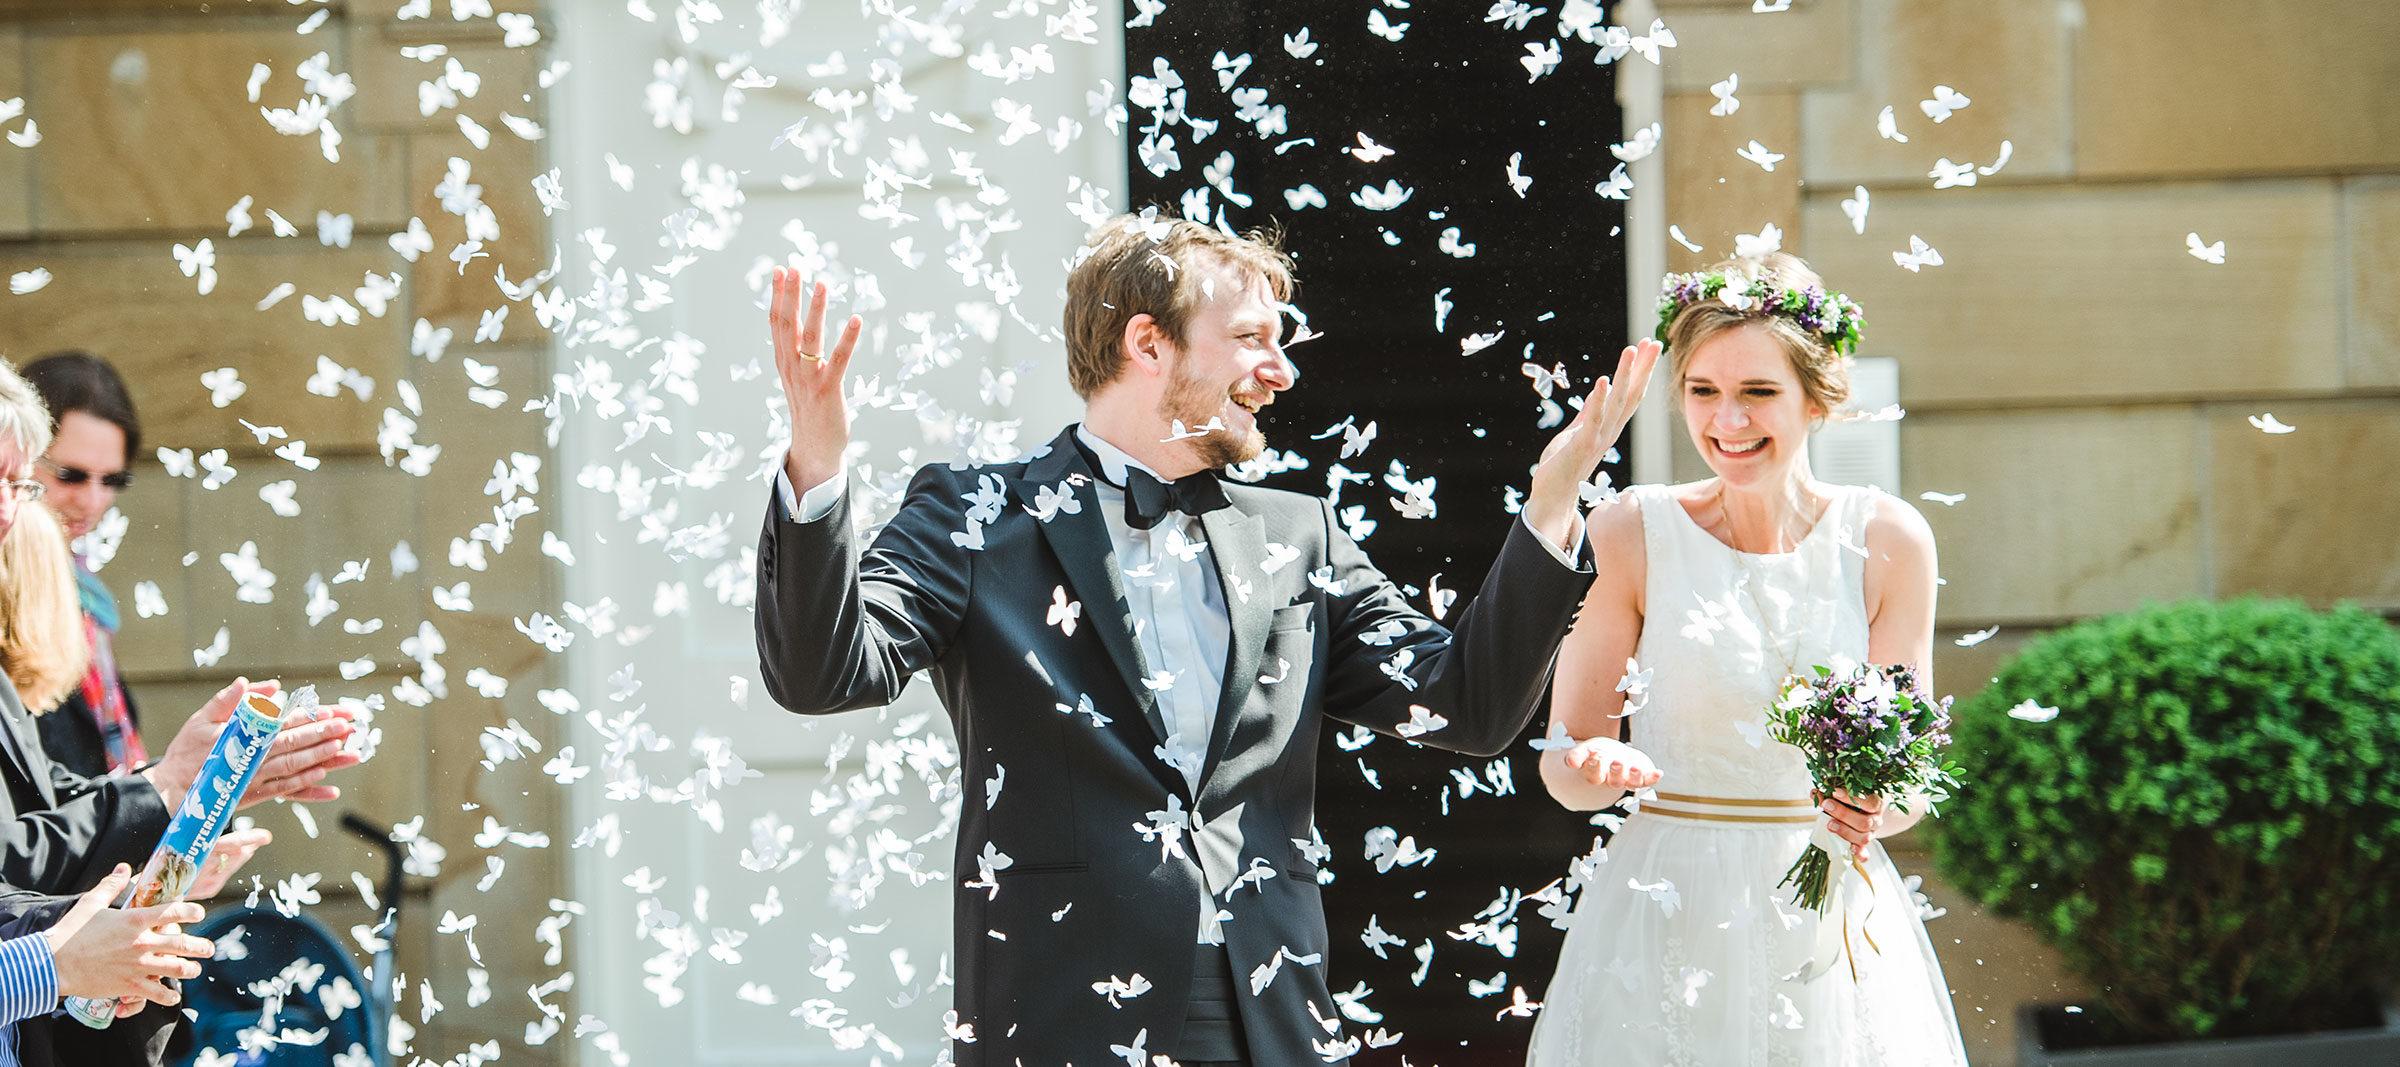 Hochzeitsfotograf Ludwigshafen